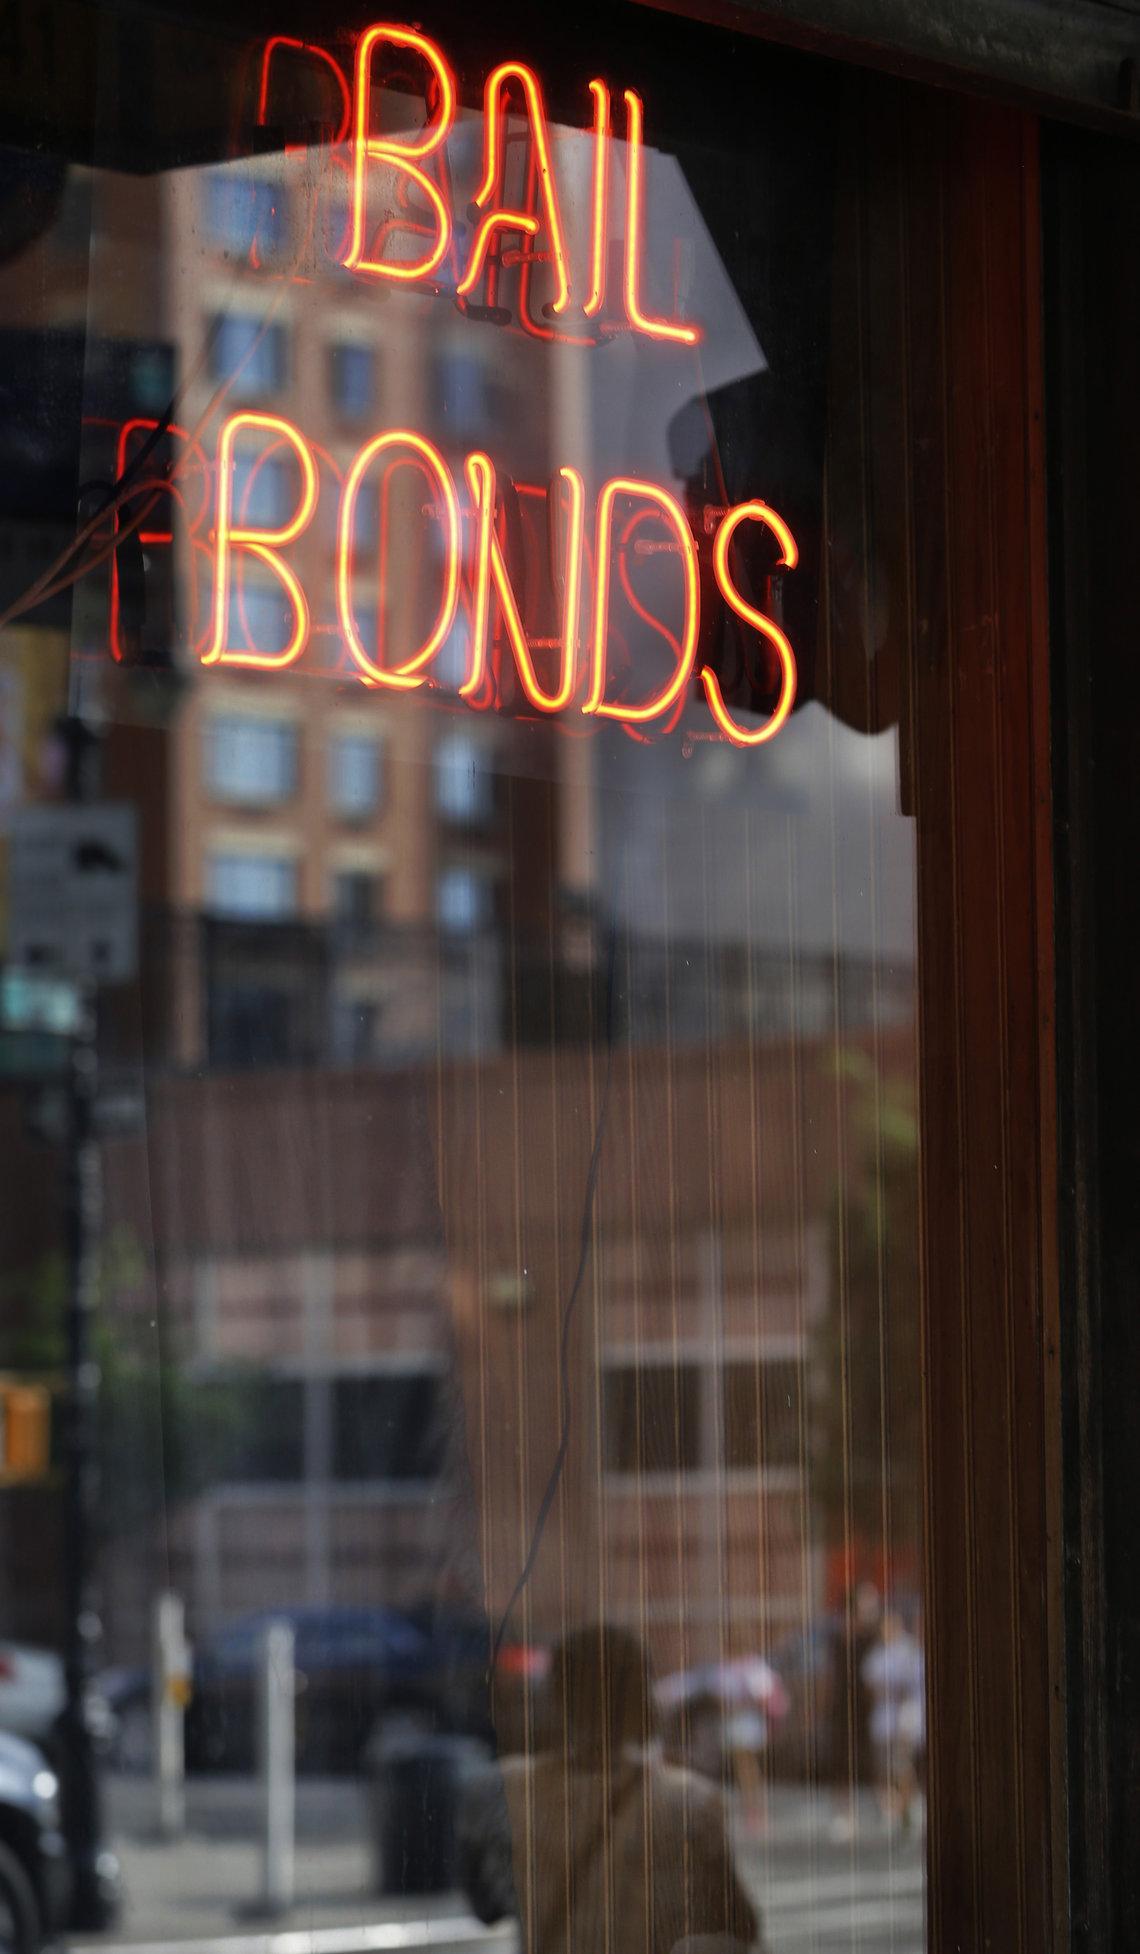 A bail bond business in Brooklyn, Ny.